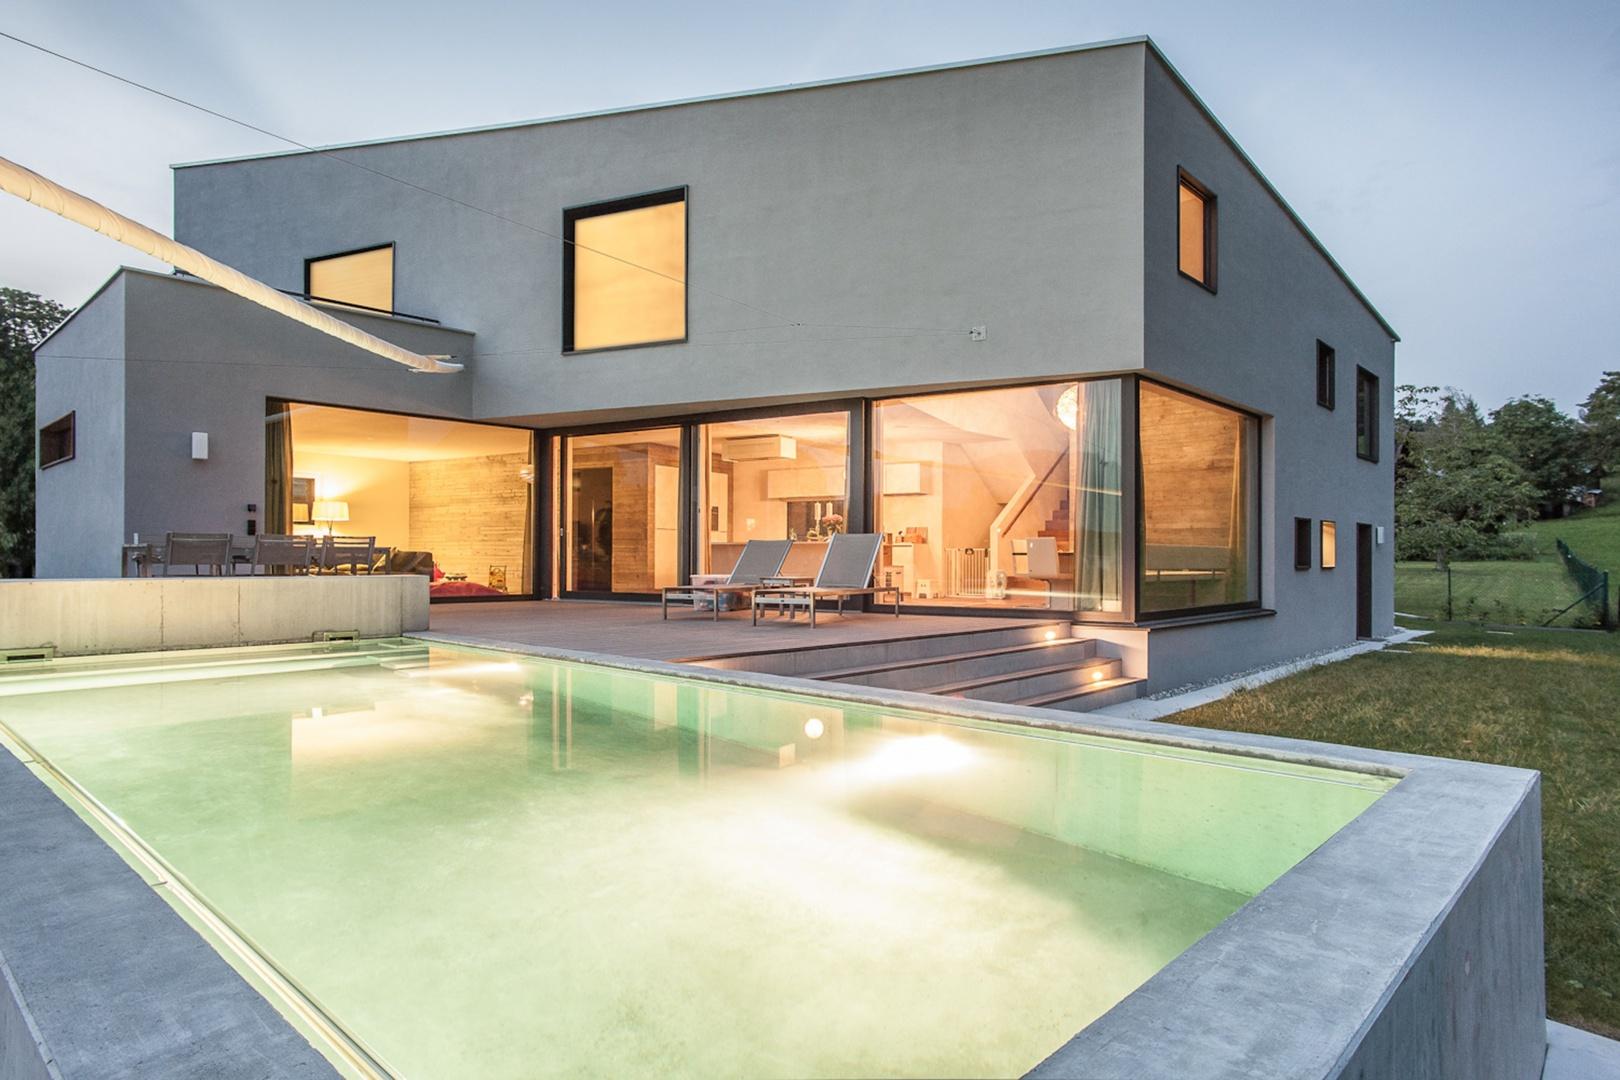 Einfamilienhaus im b hl documentation suisse du batiment for Pramierte einfamilienhauser